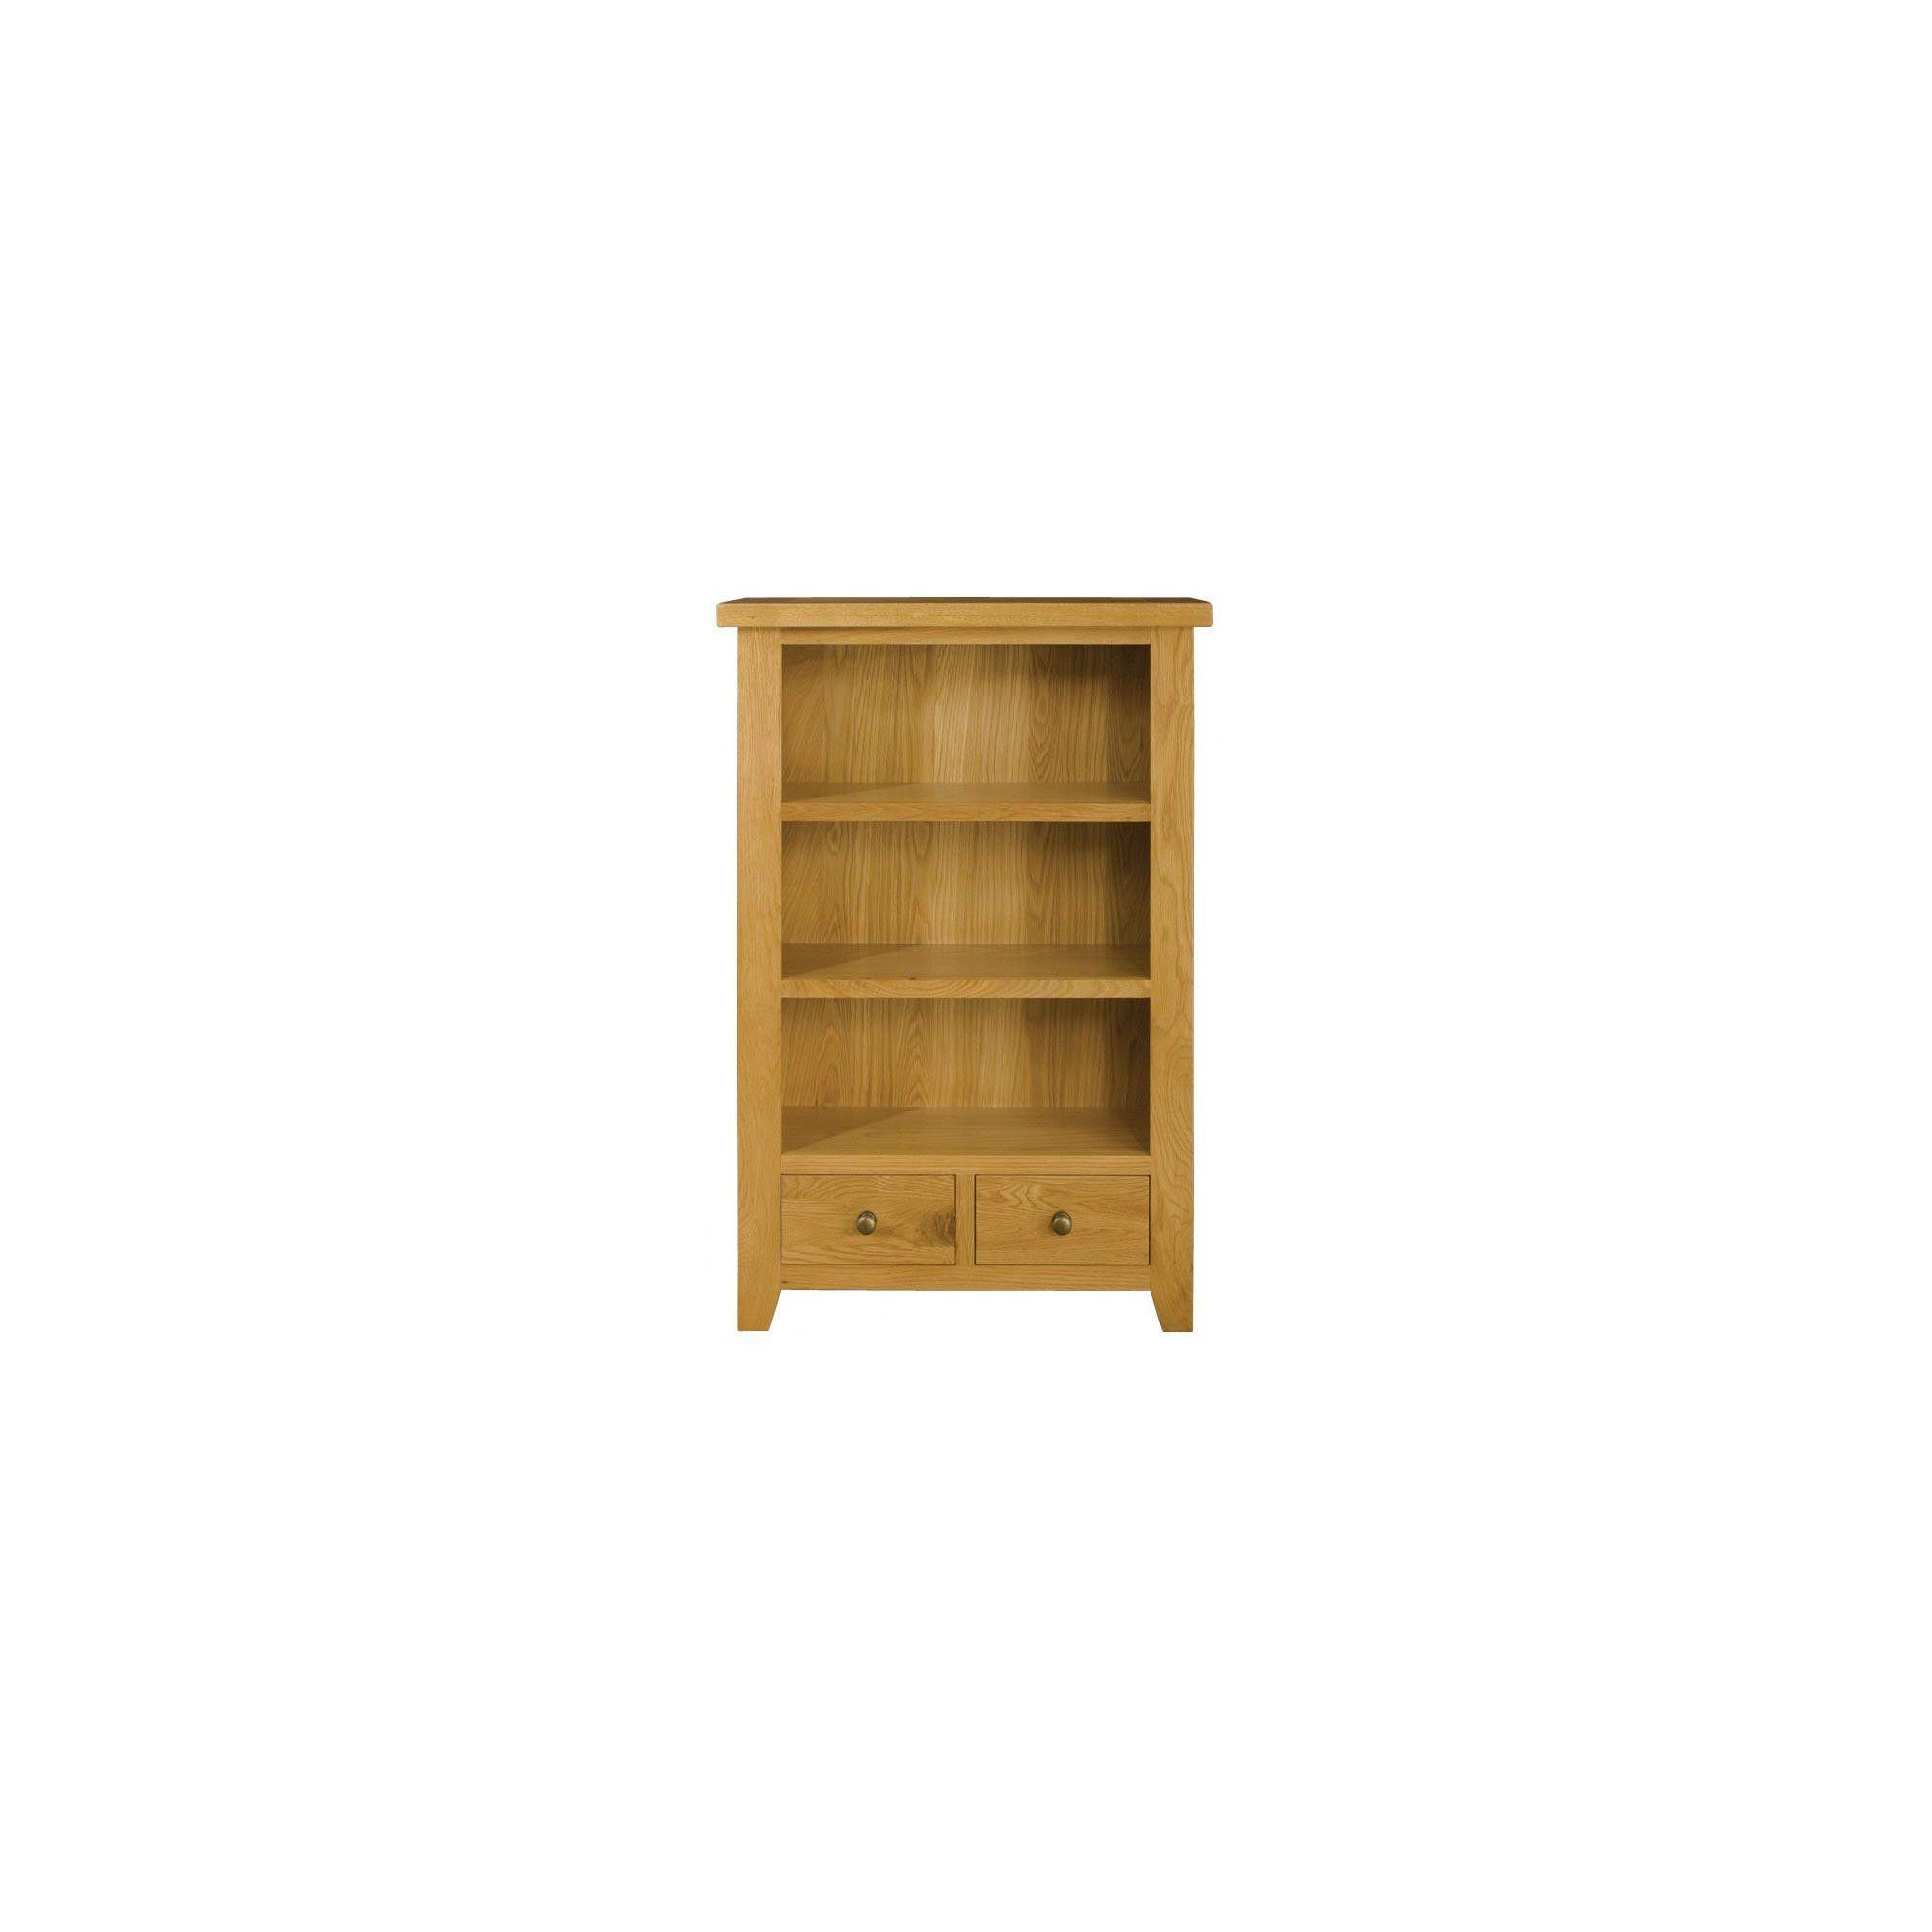 Alterton Furniture Michigan Low Bookcase at Tesco Direct